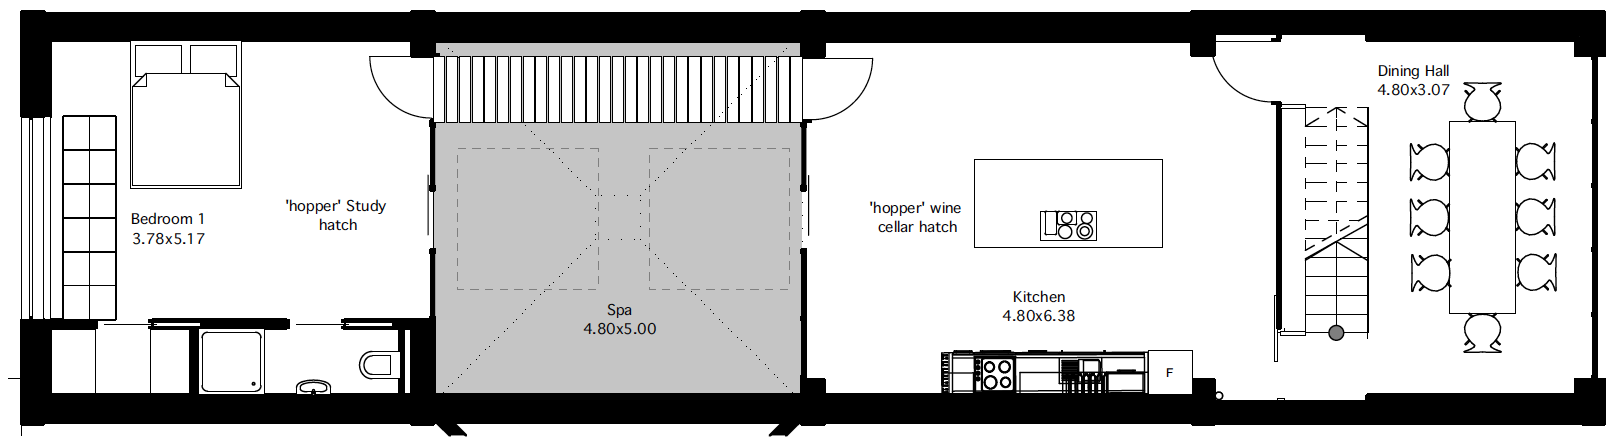 Flat 2 third floor plan